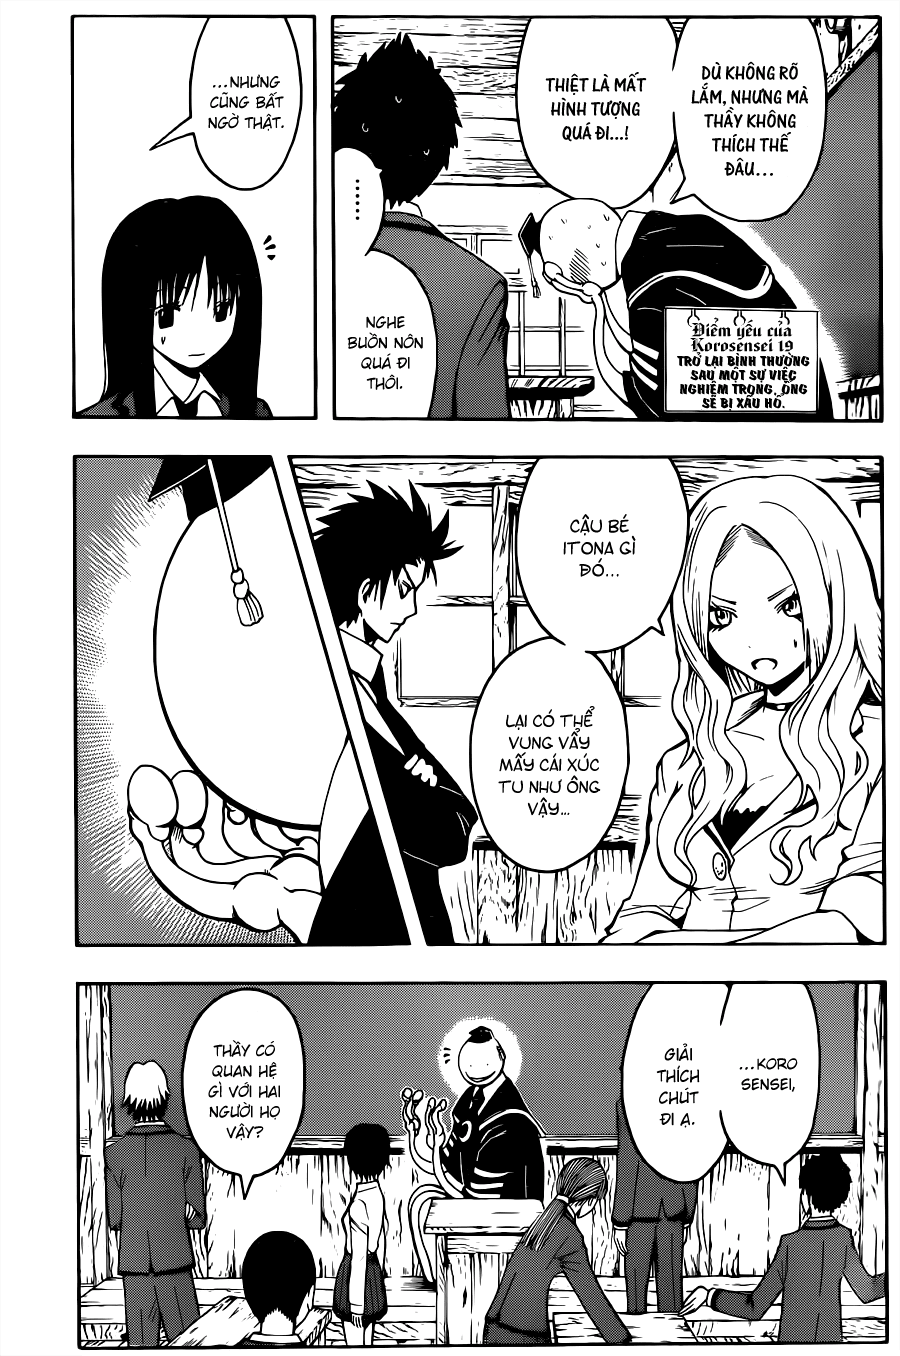 Ansatsu Kyoushitsu chap 32 trang 10